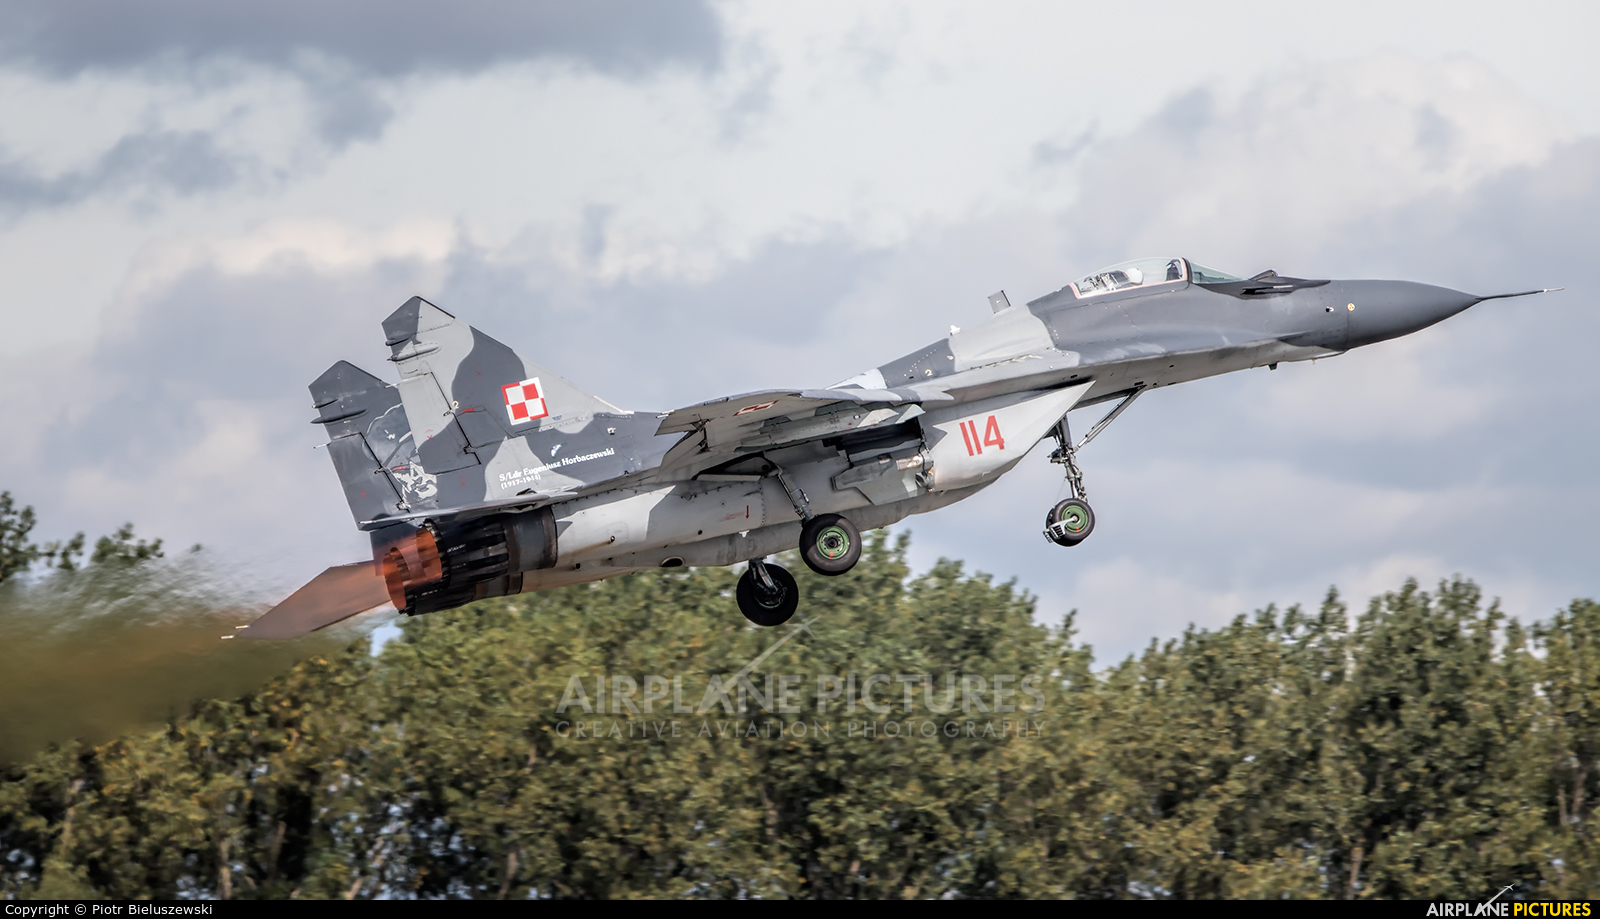 Poland - Air Force 114 aircraft at Poznań - Krzesiny